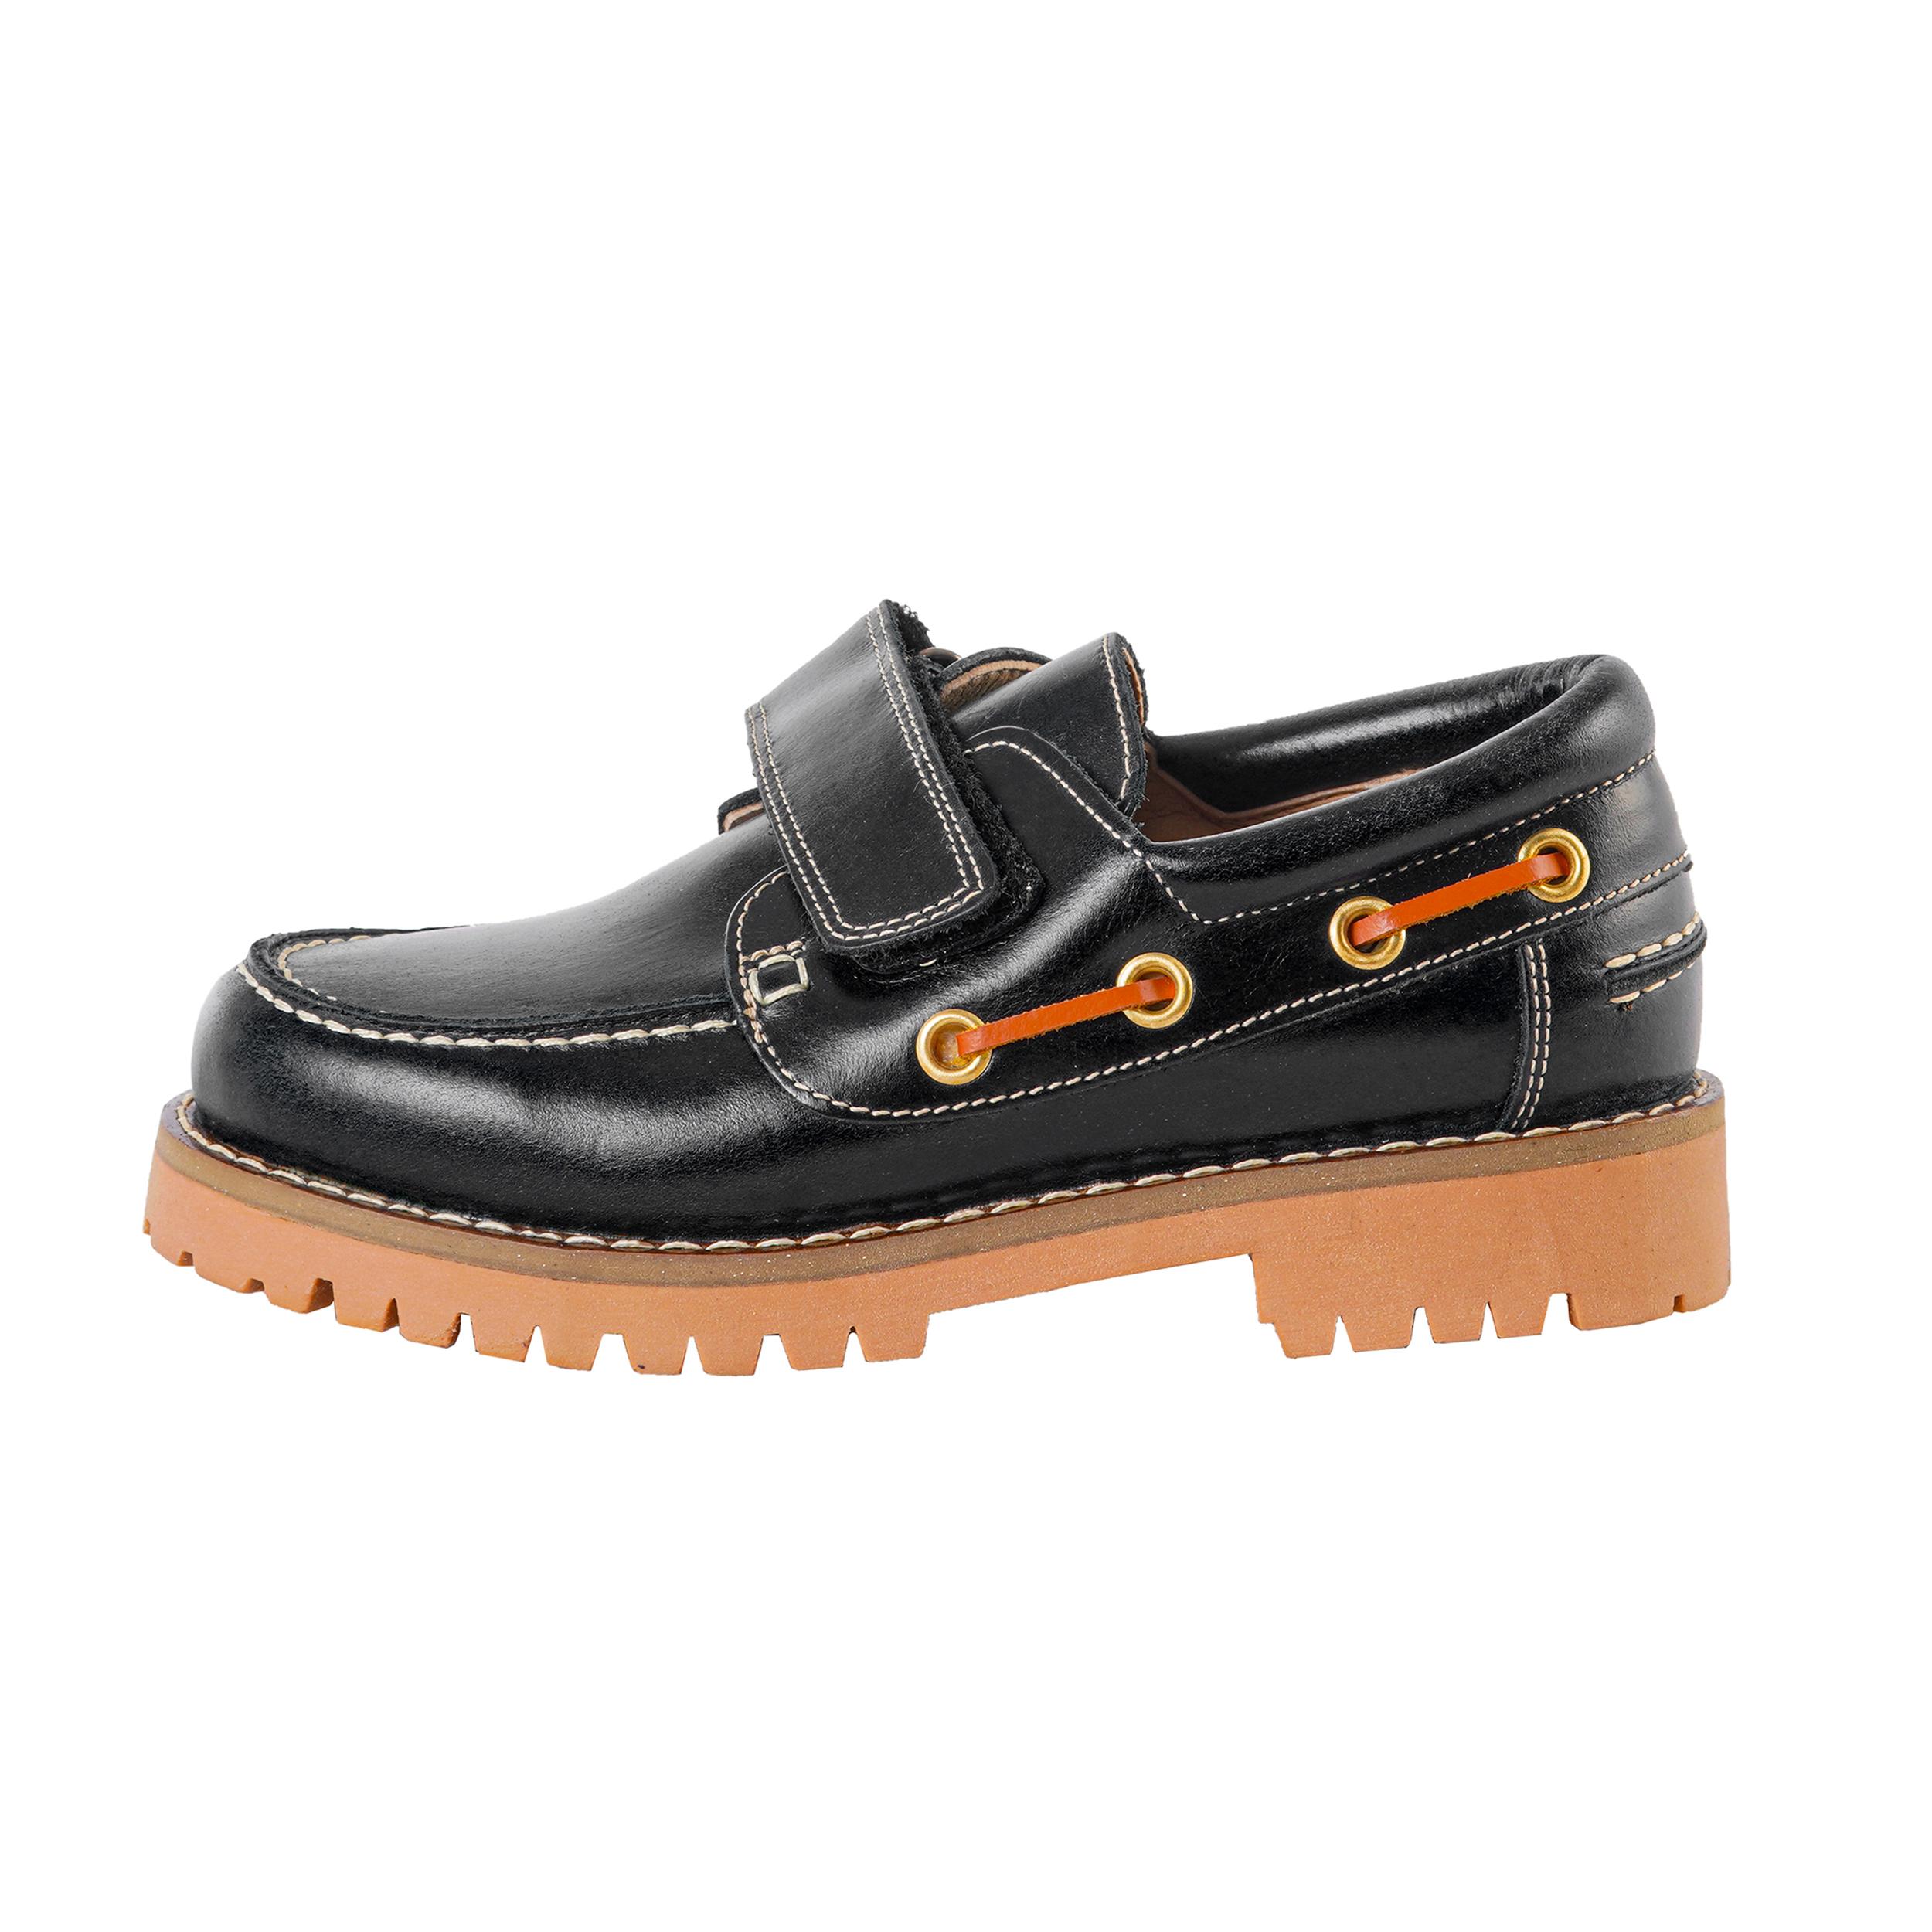 کفش پسرانه صاد کد MH0302